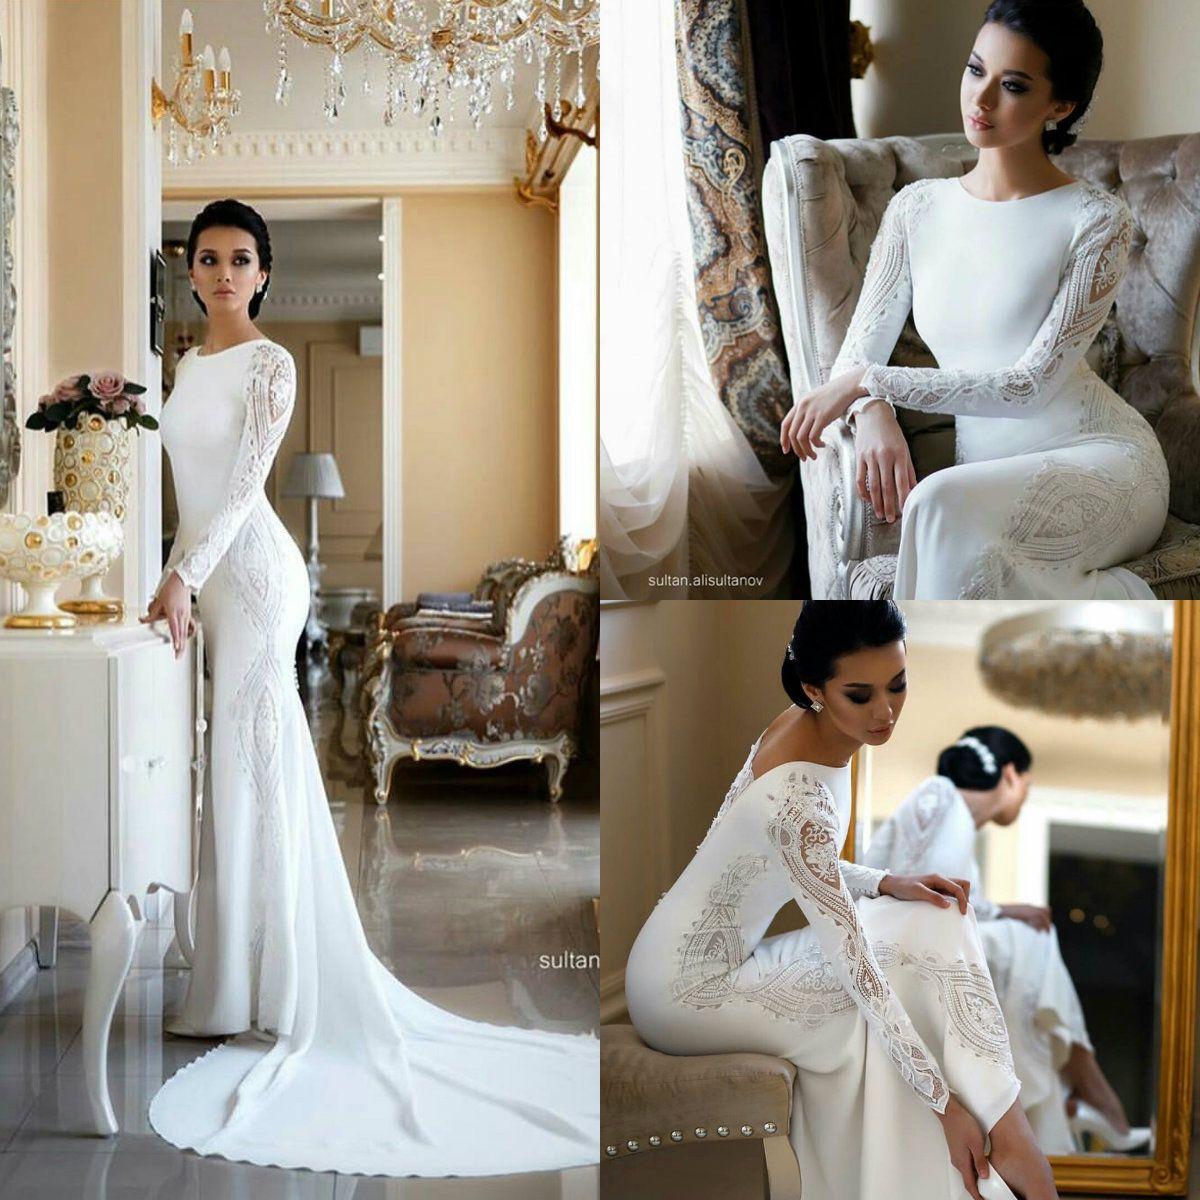 2019 Modeste sirène robes de mariée en dentelle de perles Appliqued Berta balayage train robe de mariée Boho Robes de mariée manches de taille plus Abiti da sposa